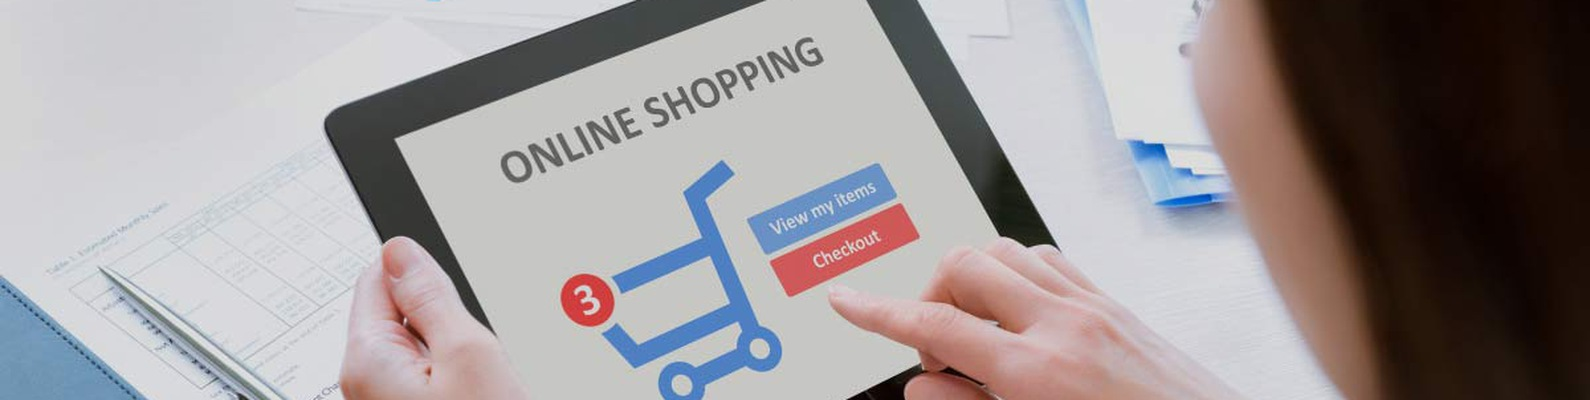 Xoom 401k online shopping videos